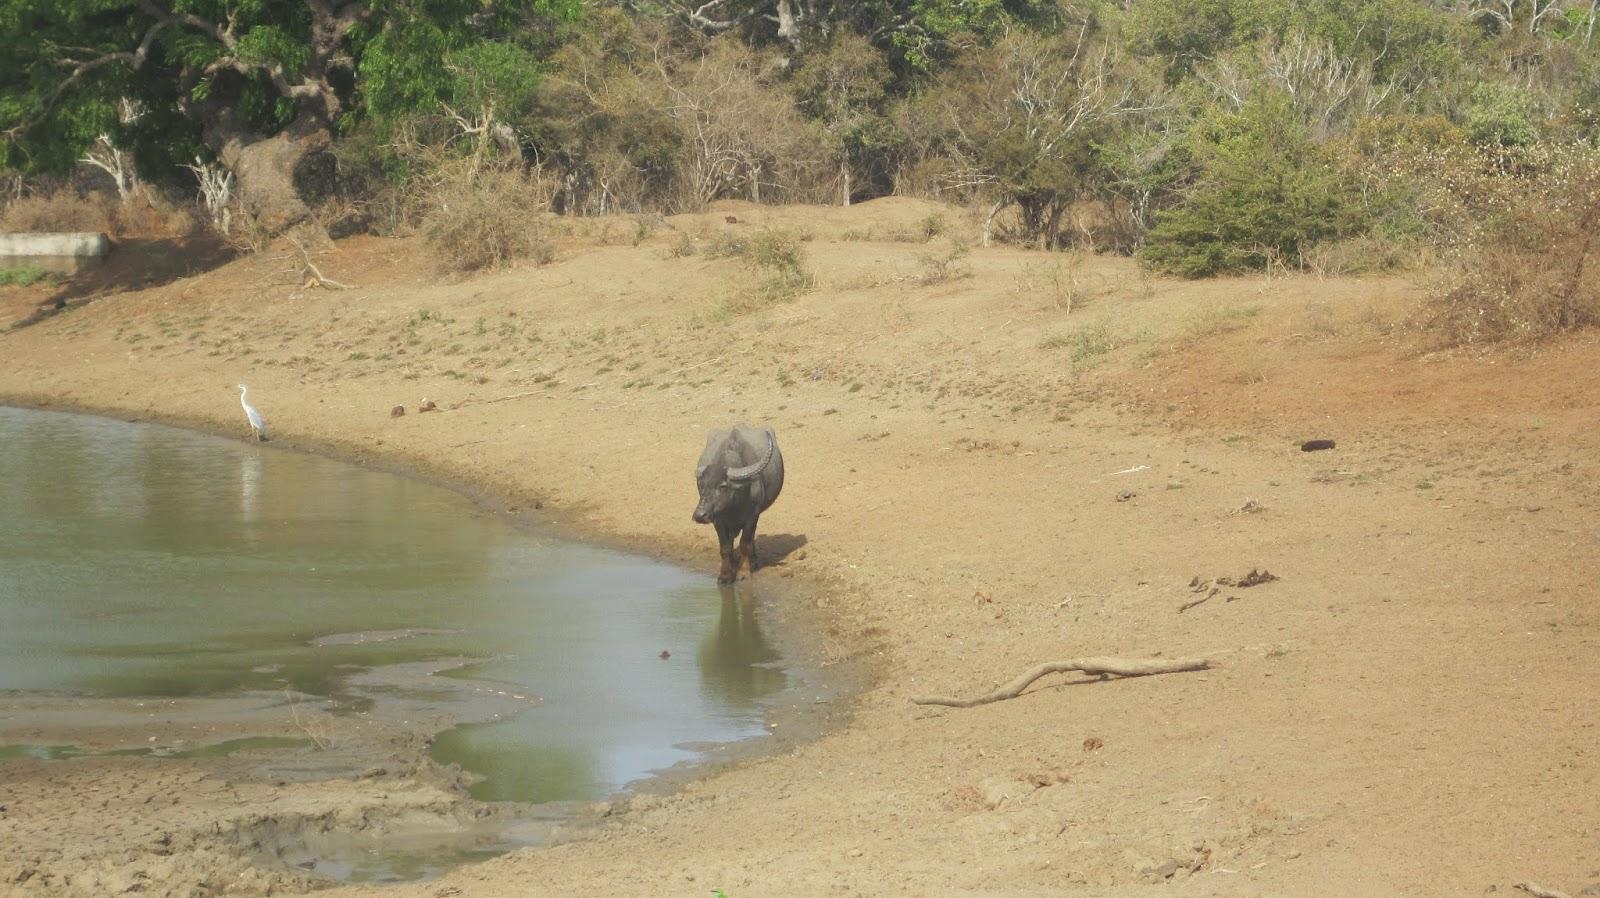 Búfalo en el Parque Nacional de Yala (Sri Lanka)